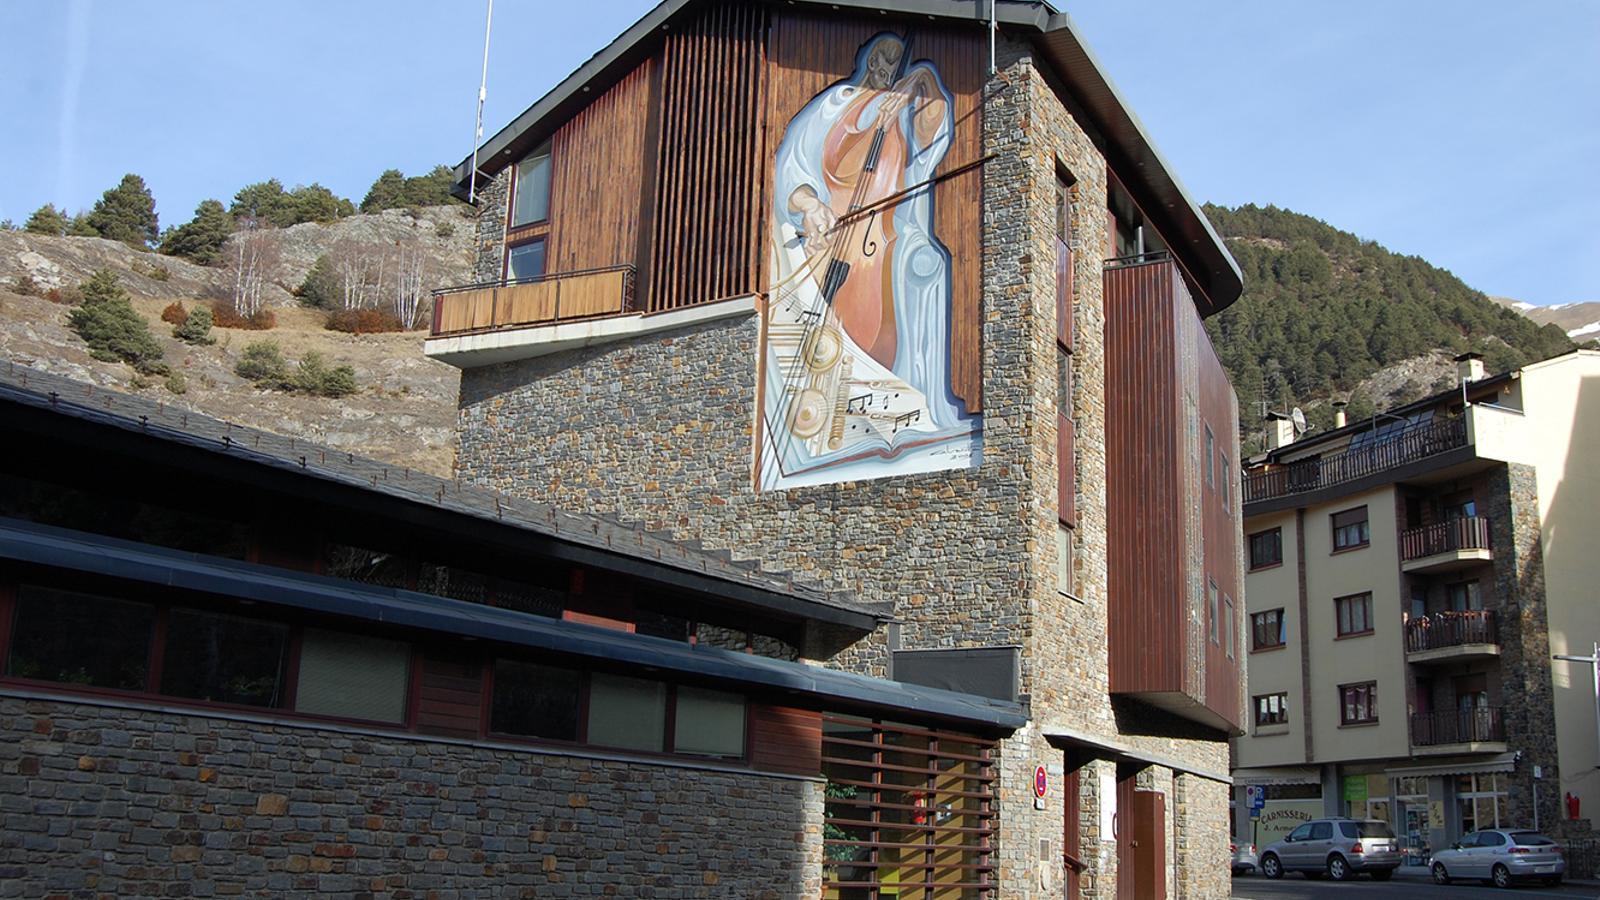 Una imatge de la Casa pairal d'Ordino. / ARXIU ANA